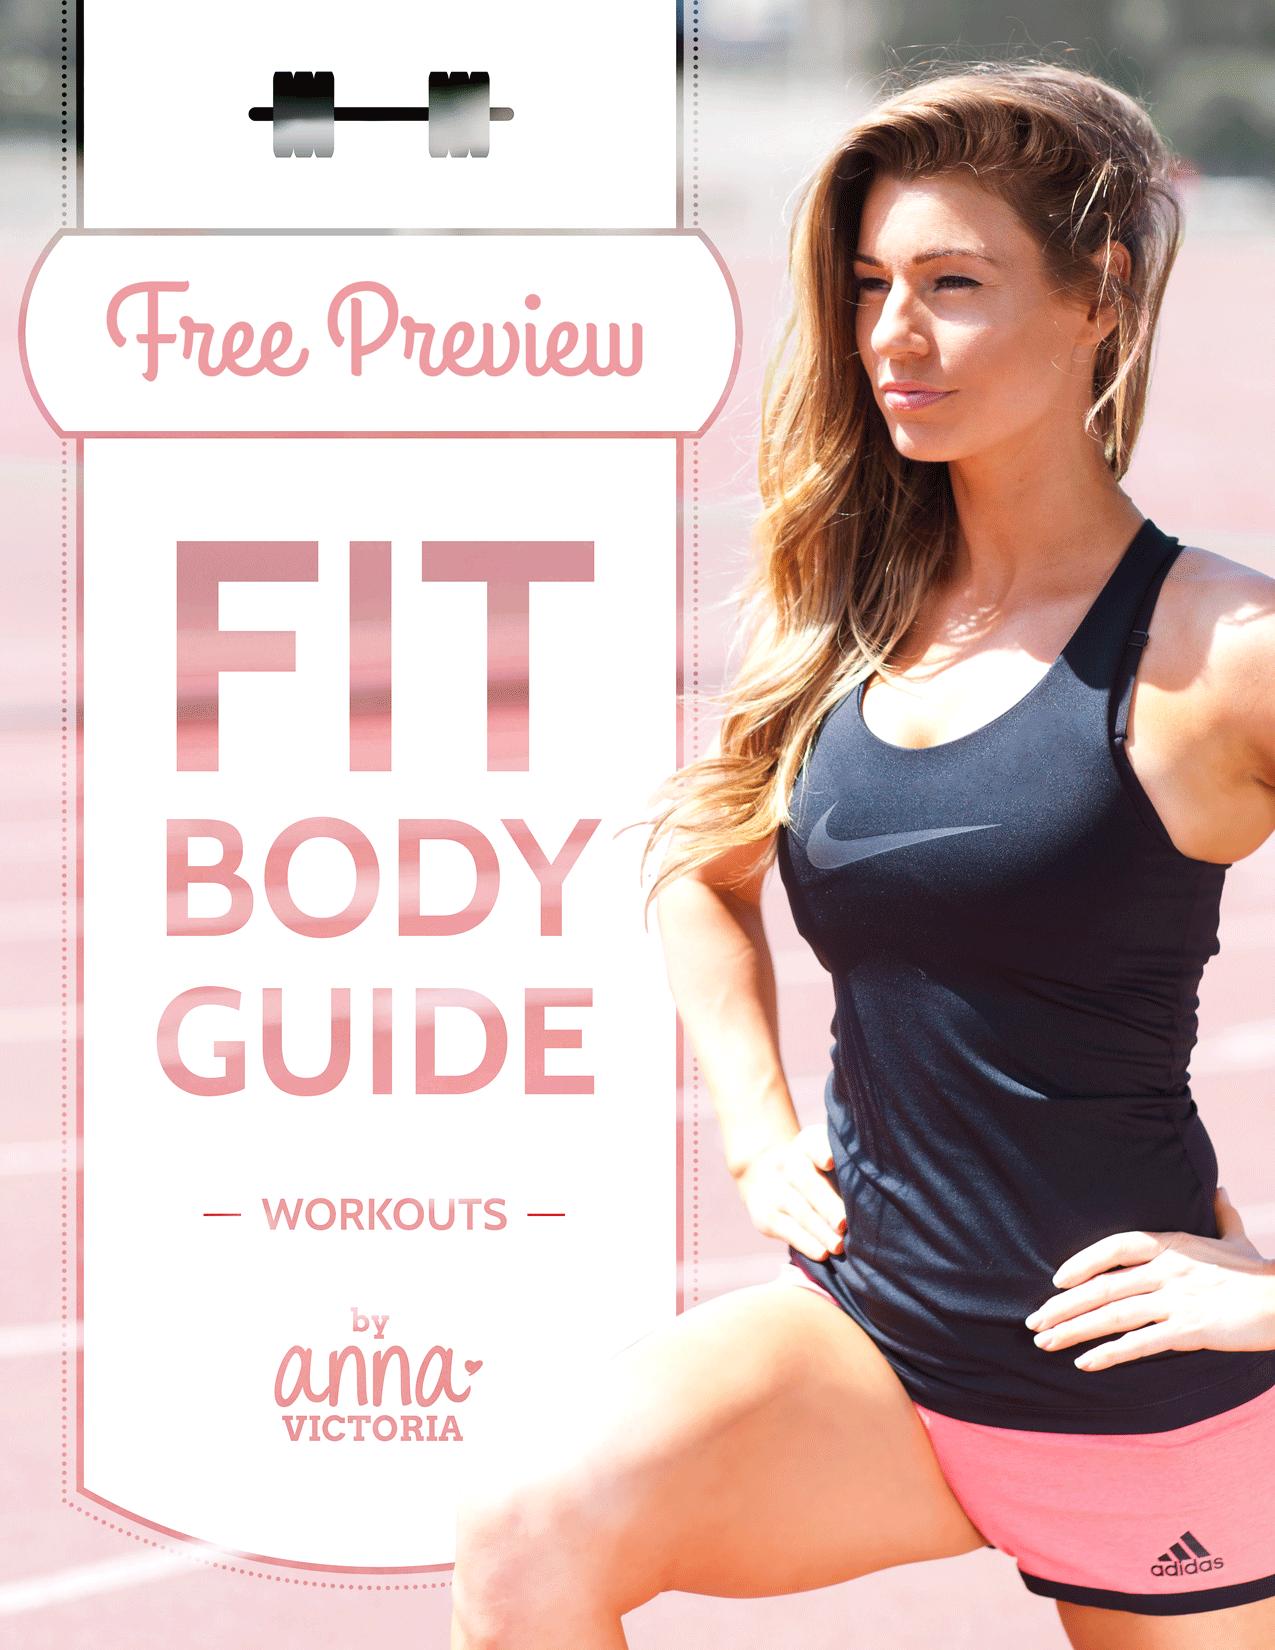 FREE PREVIEW ANNA VICTORIA Fit body guide, Anna